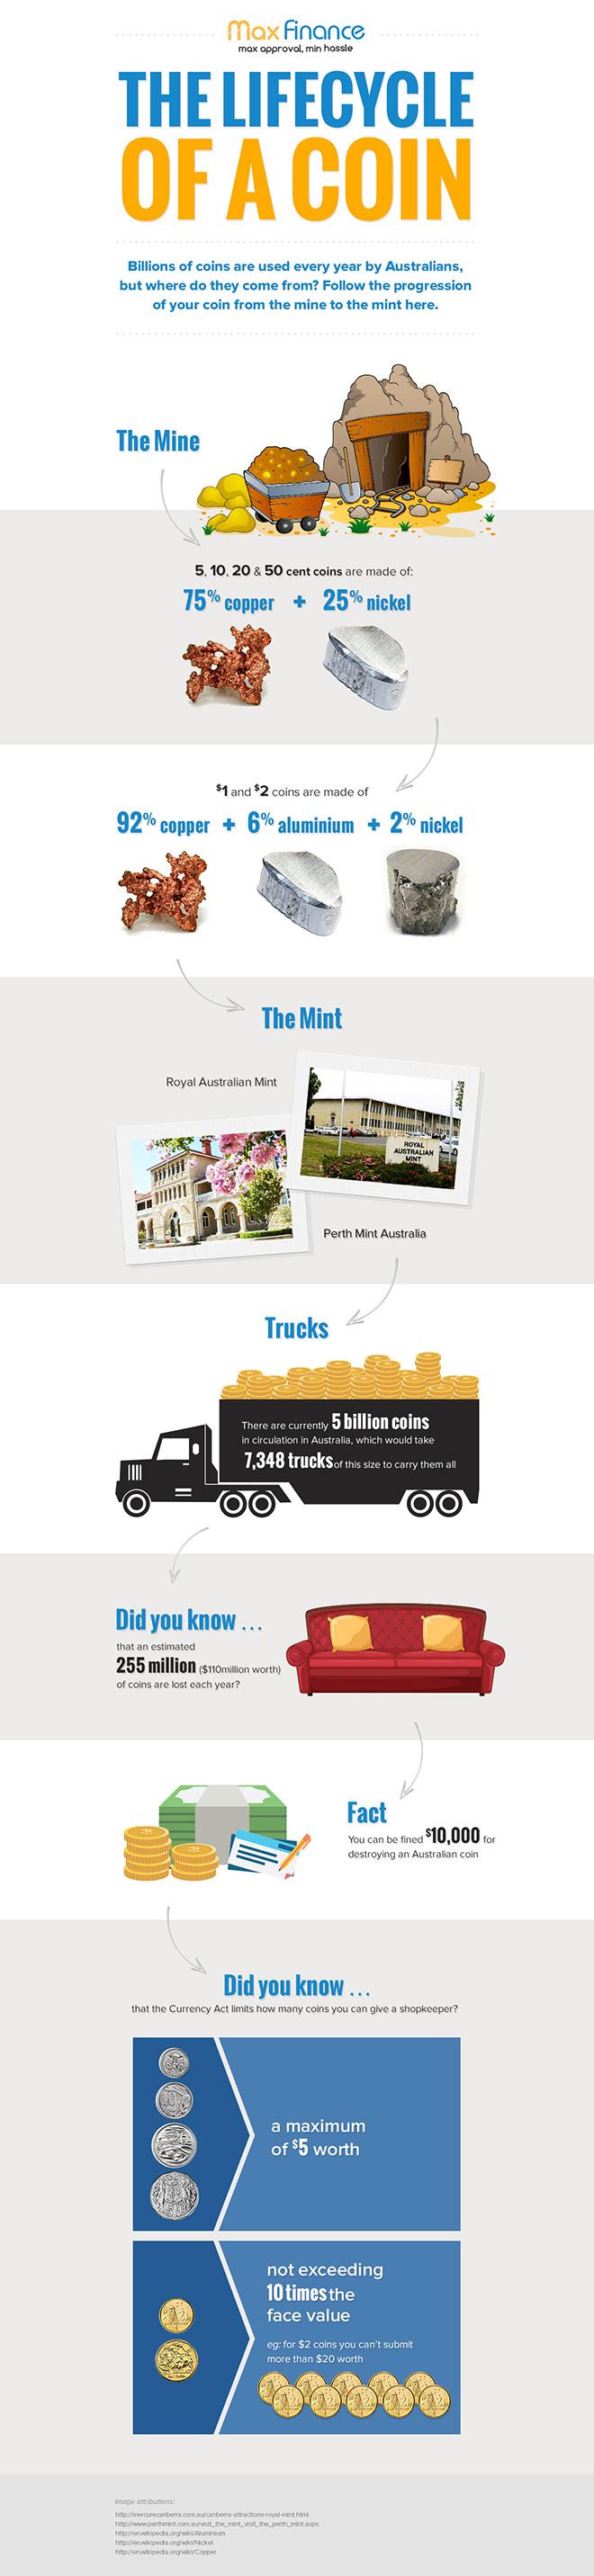 Max Finance Infographic